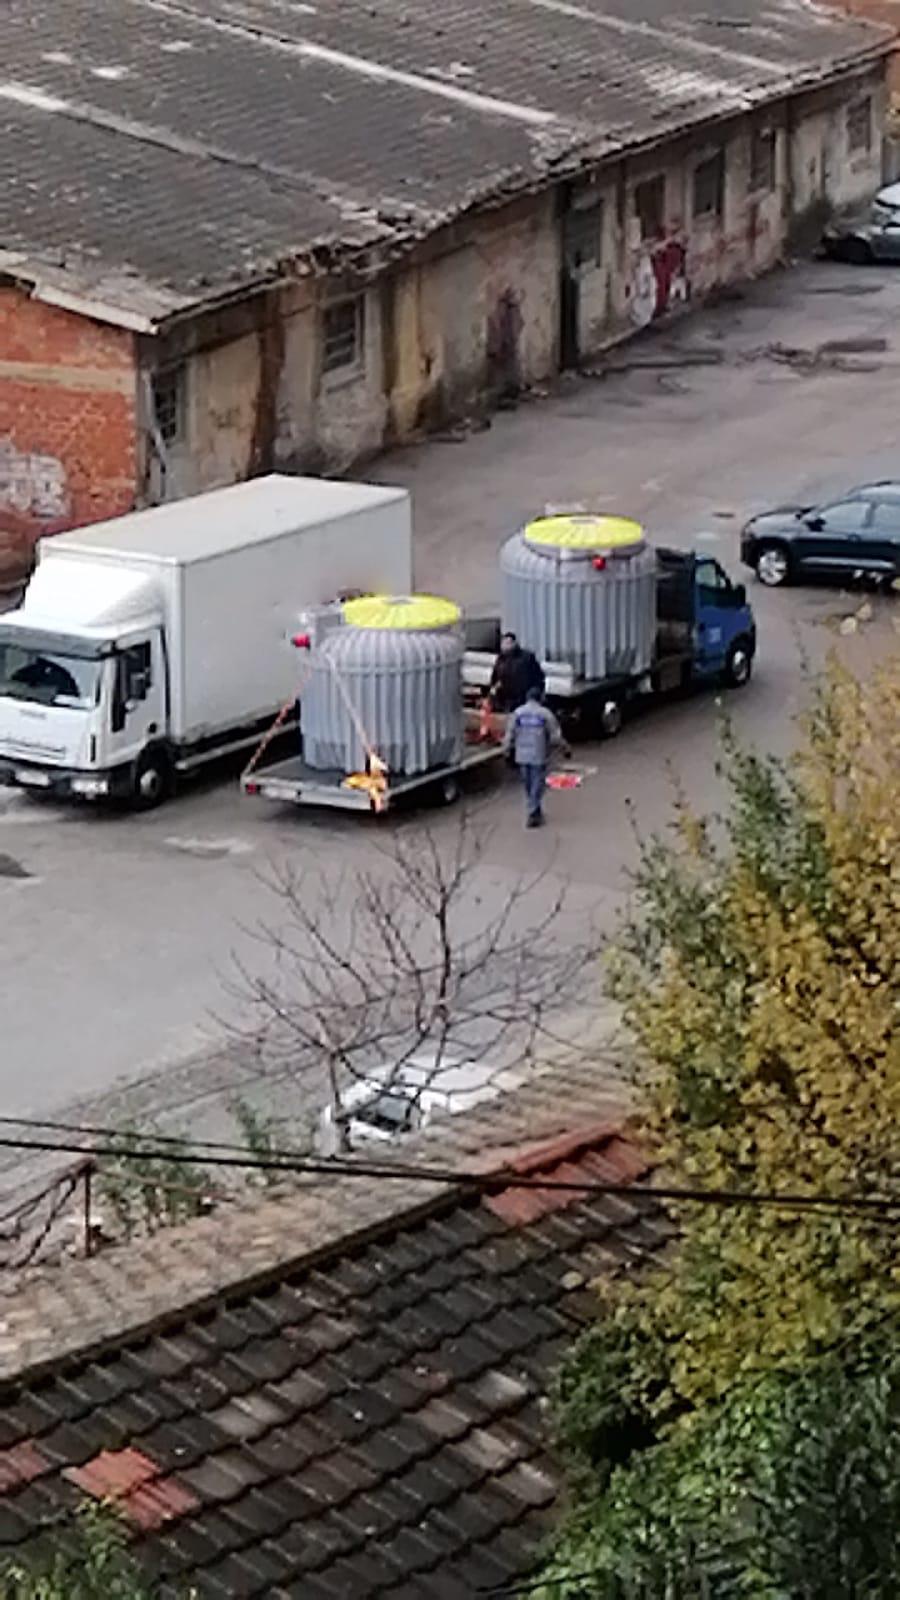 Aquos eco transport uređaja